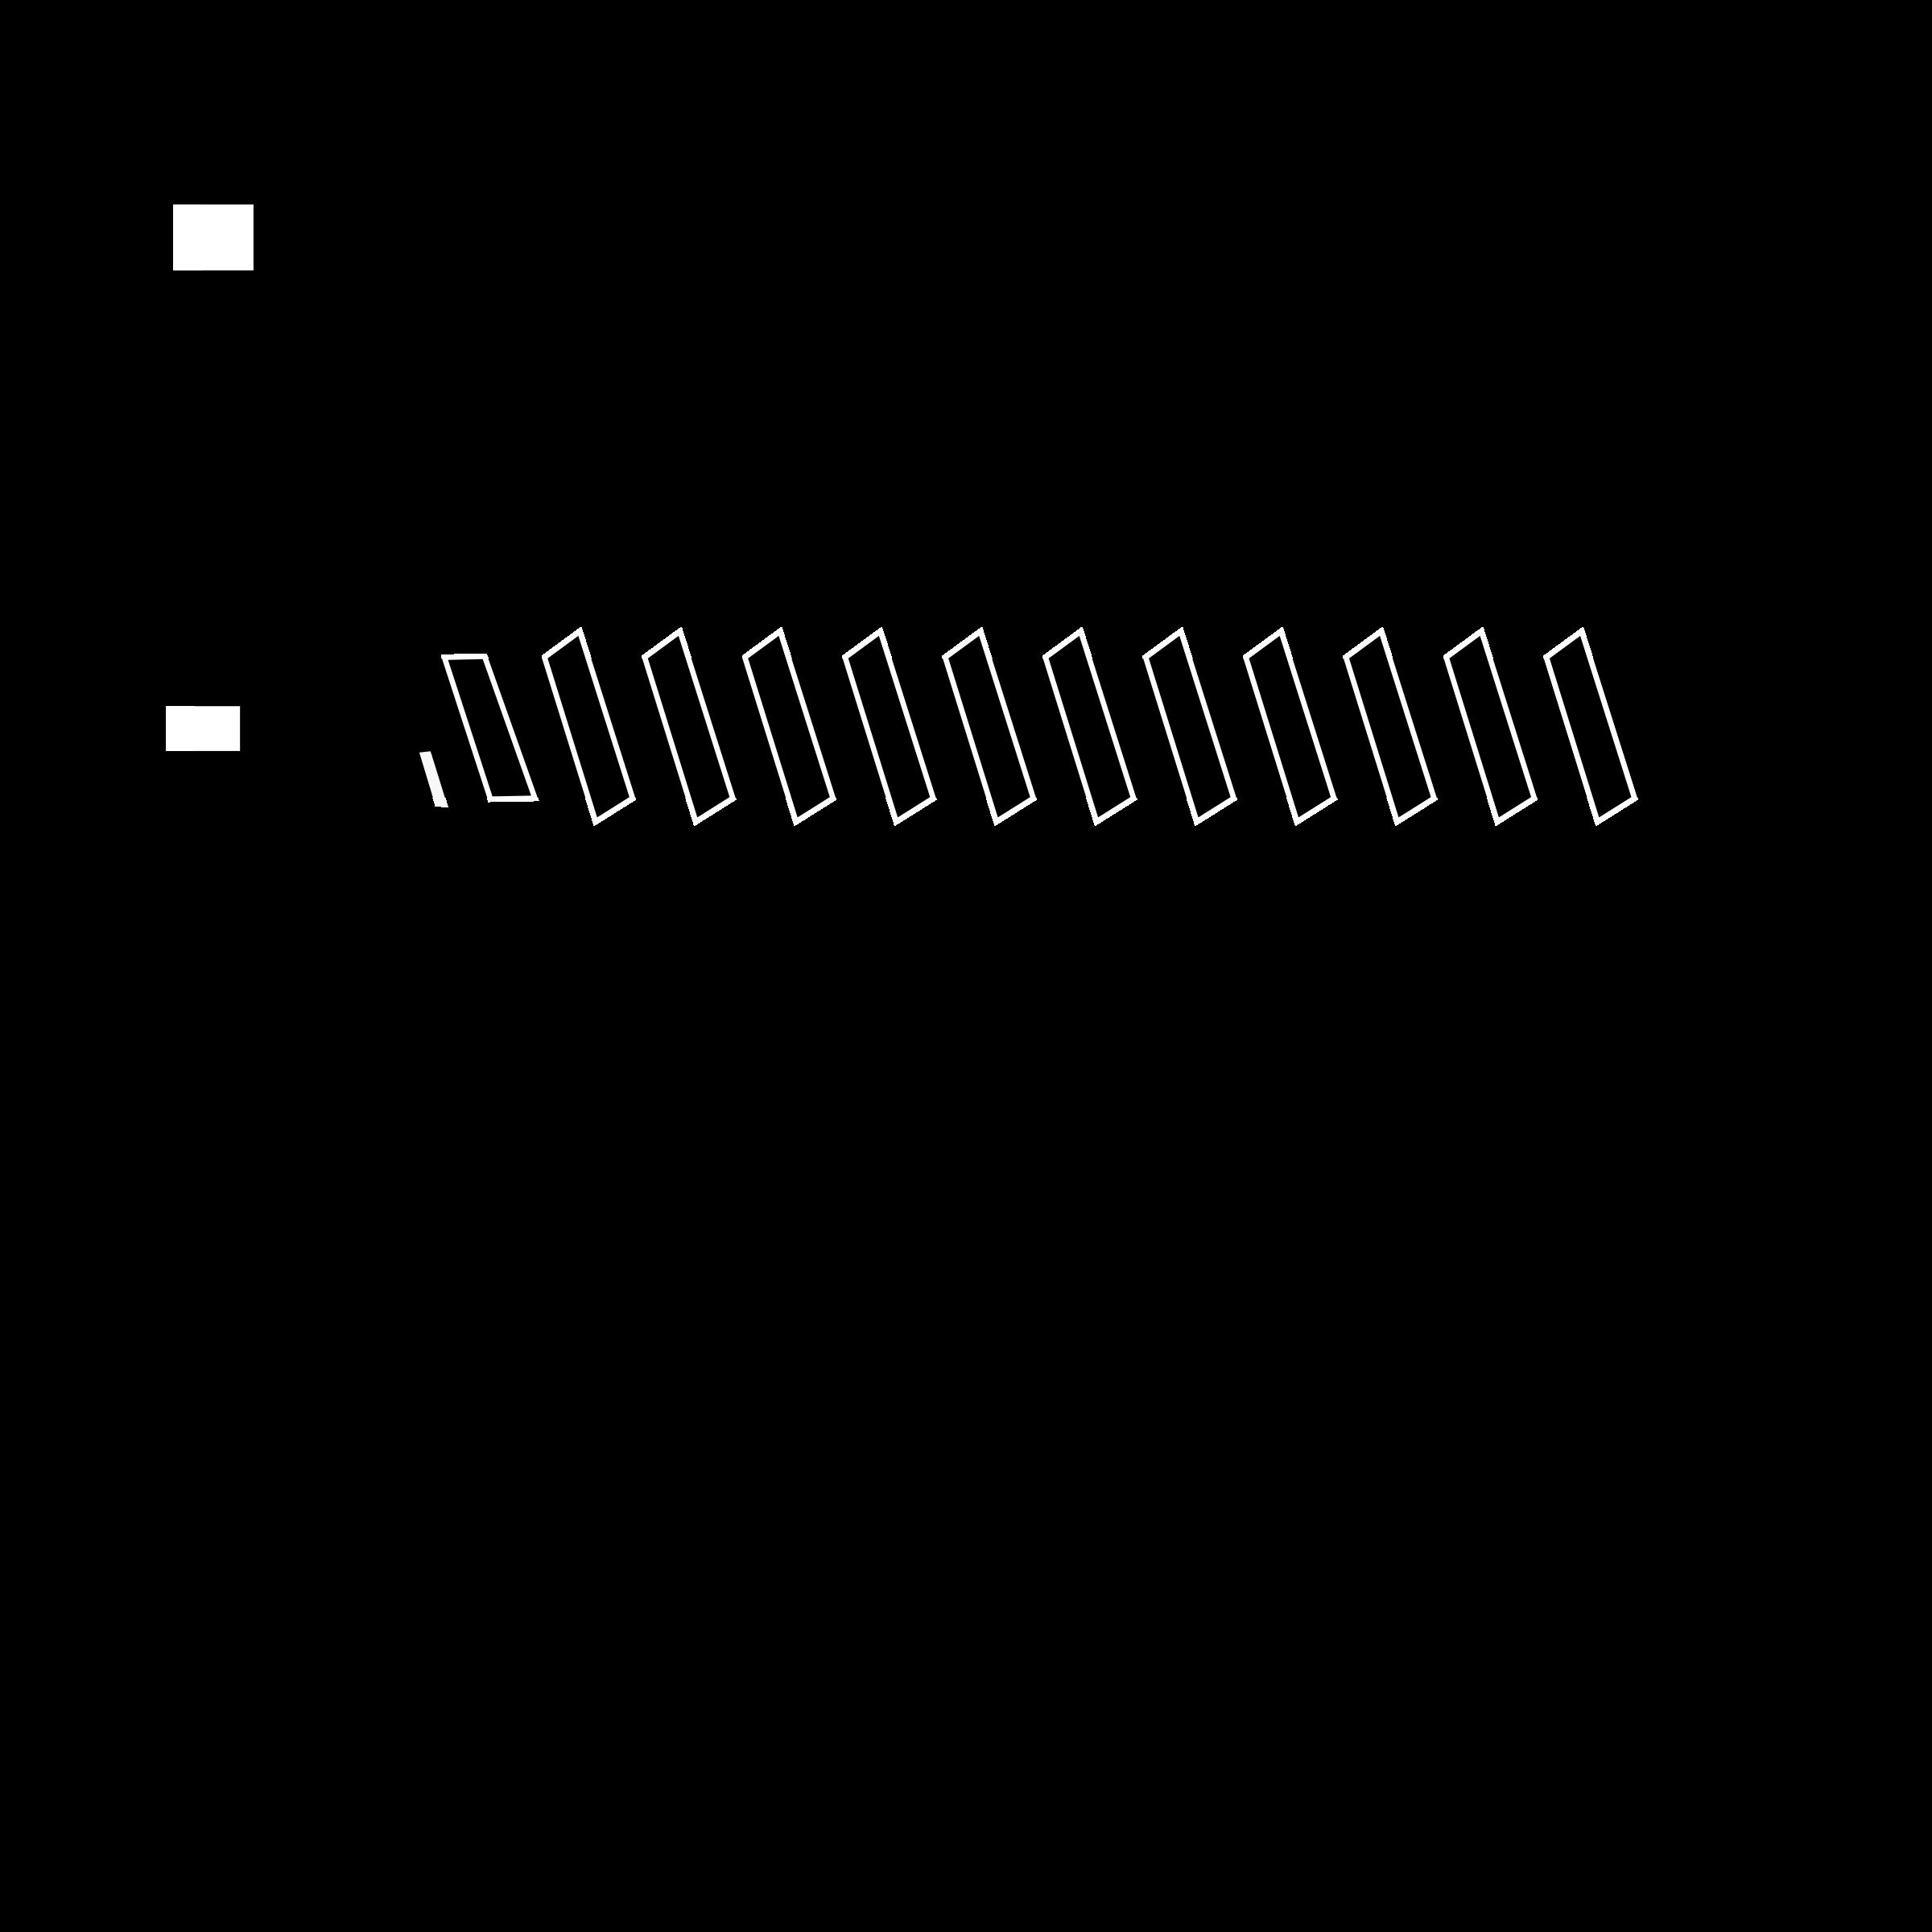 Clipart - netalloy fasteners